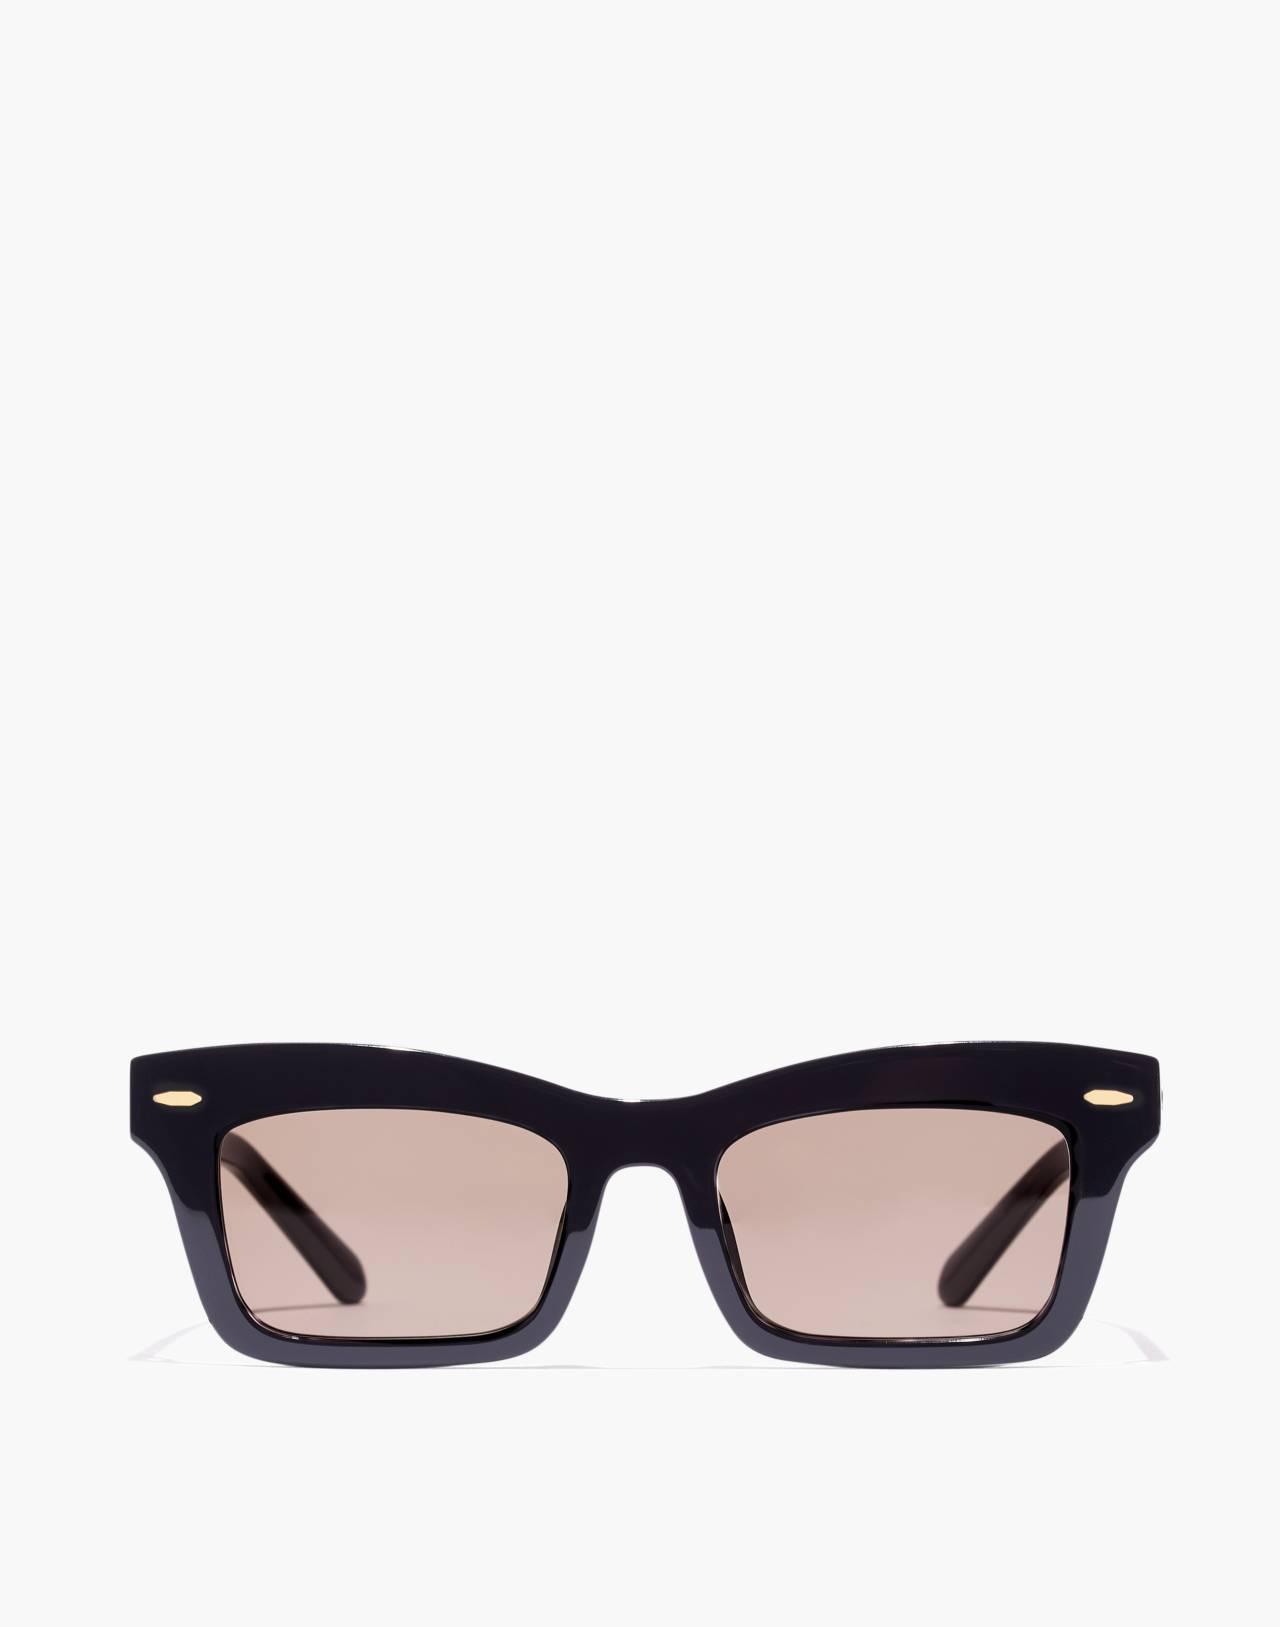 Madewell x Karen Walker® Banks Sunglasses in black image 1